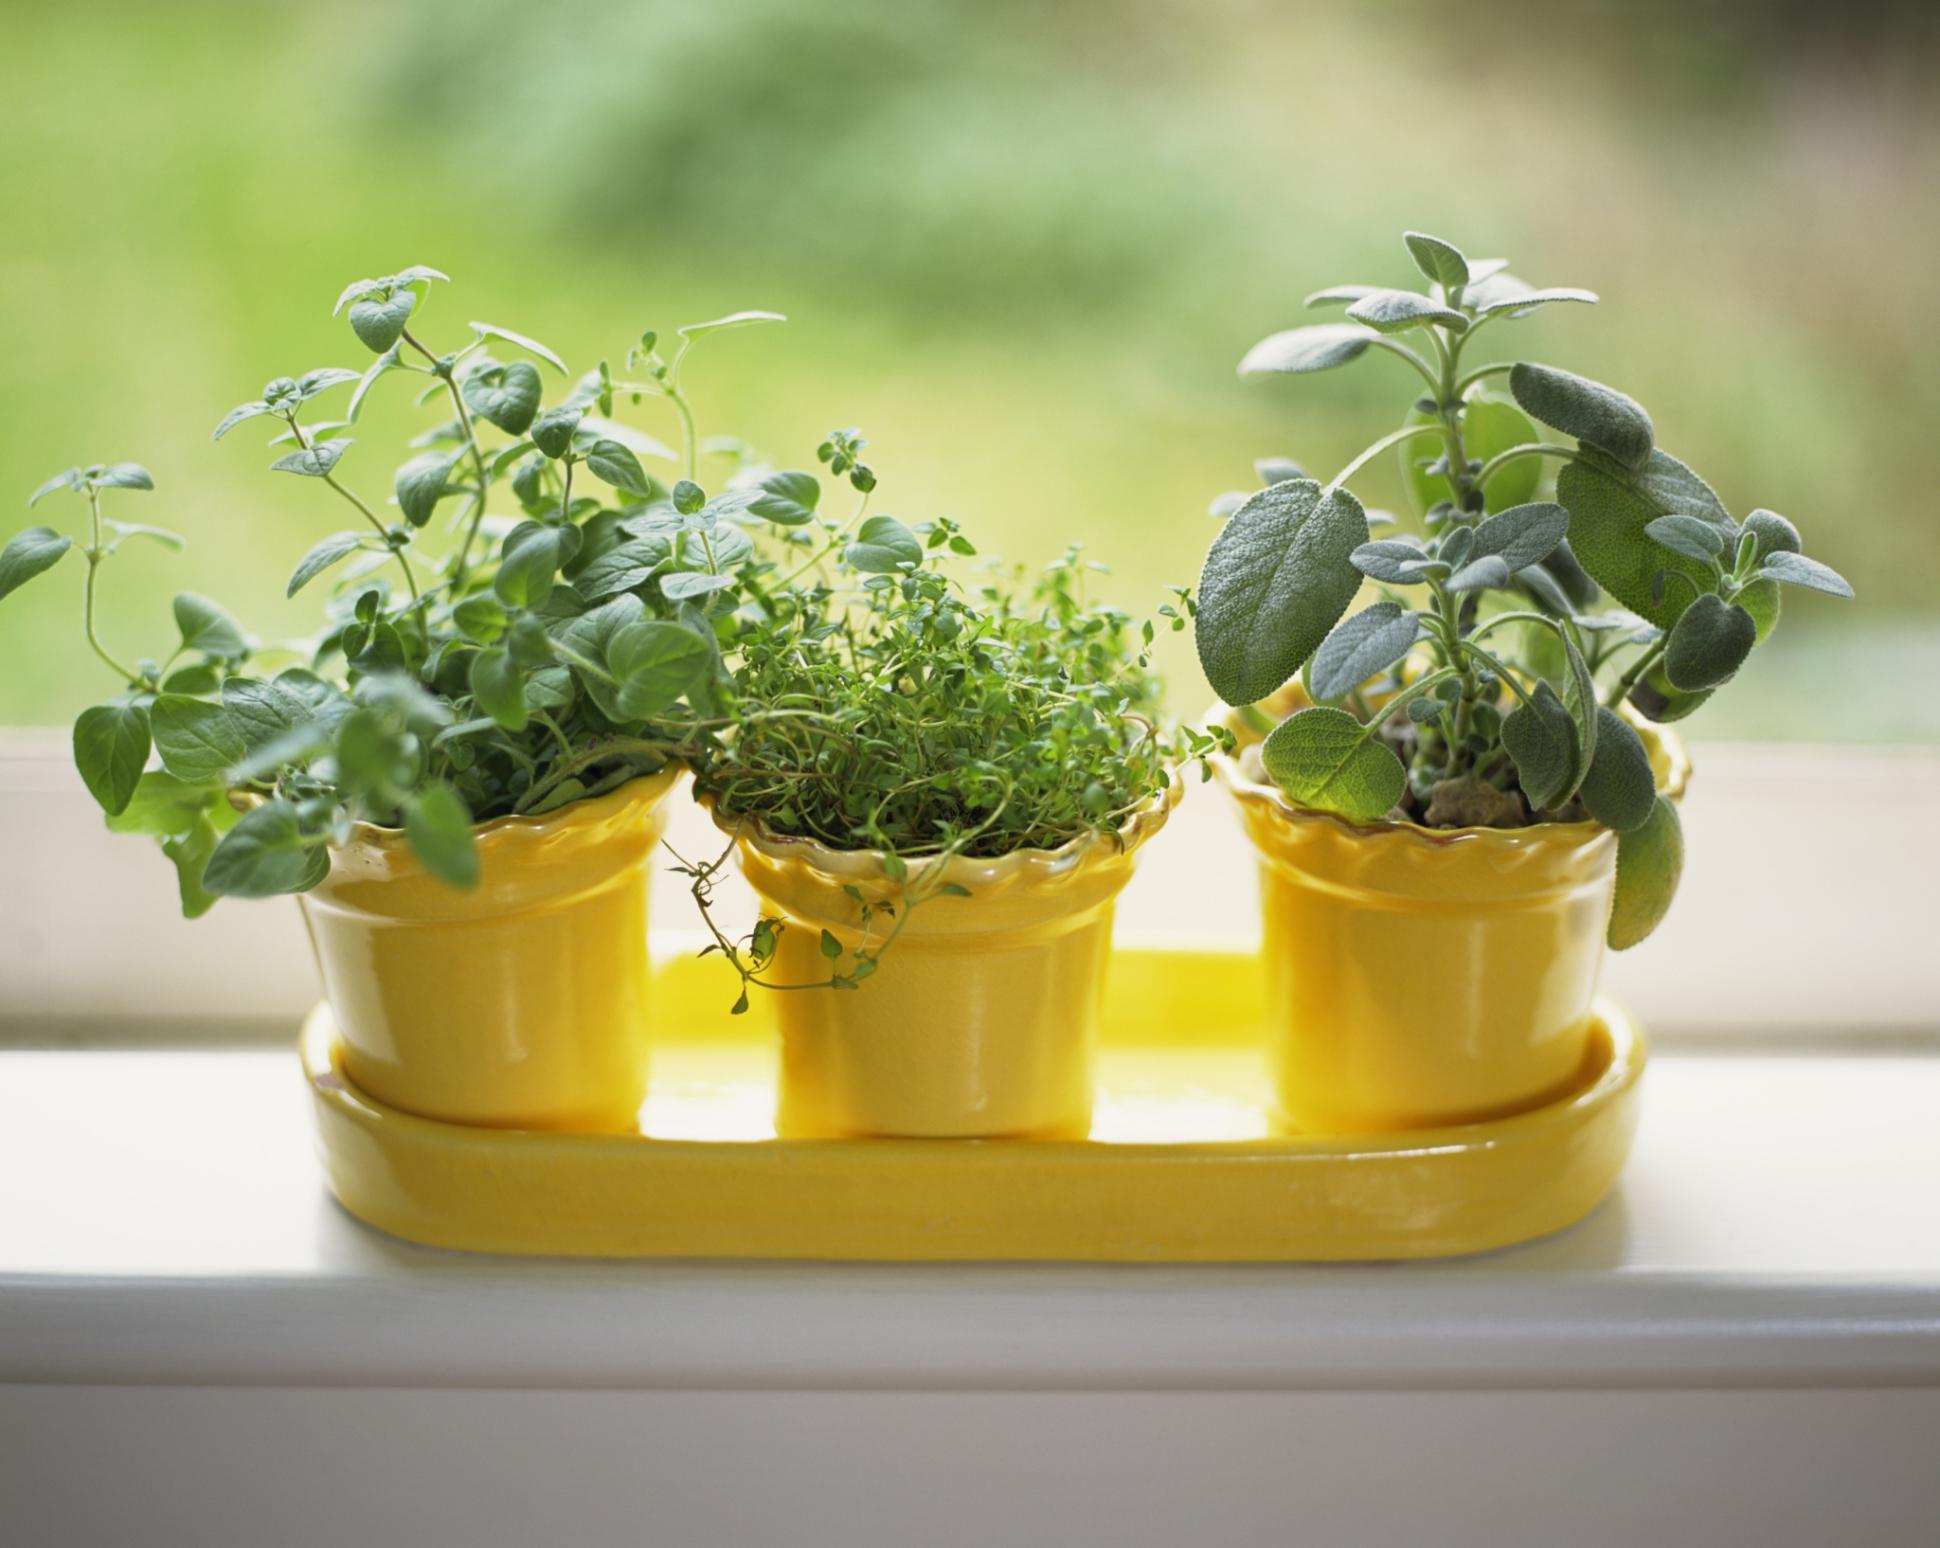 How To Grow Herbs Indoors On A Sunny Windowsill